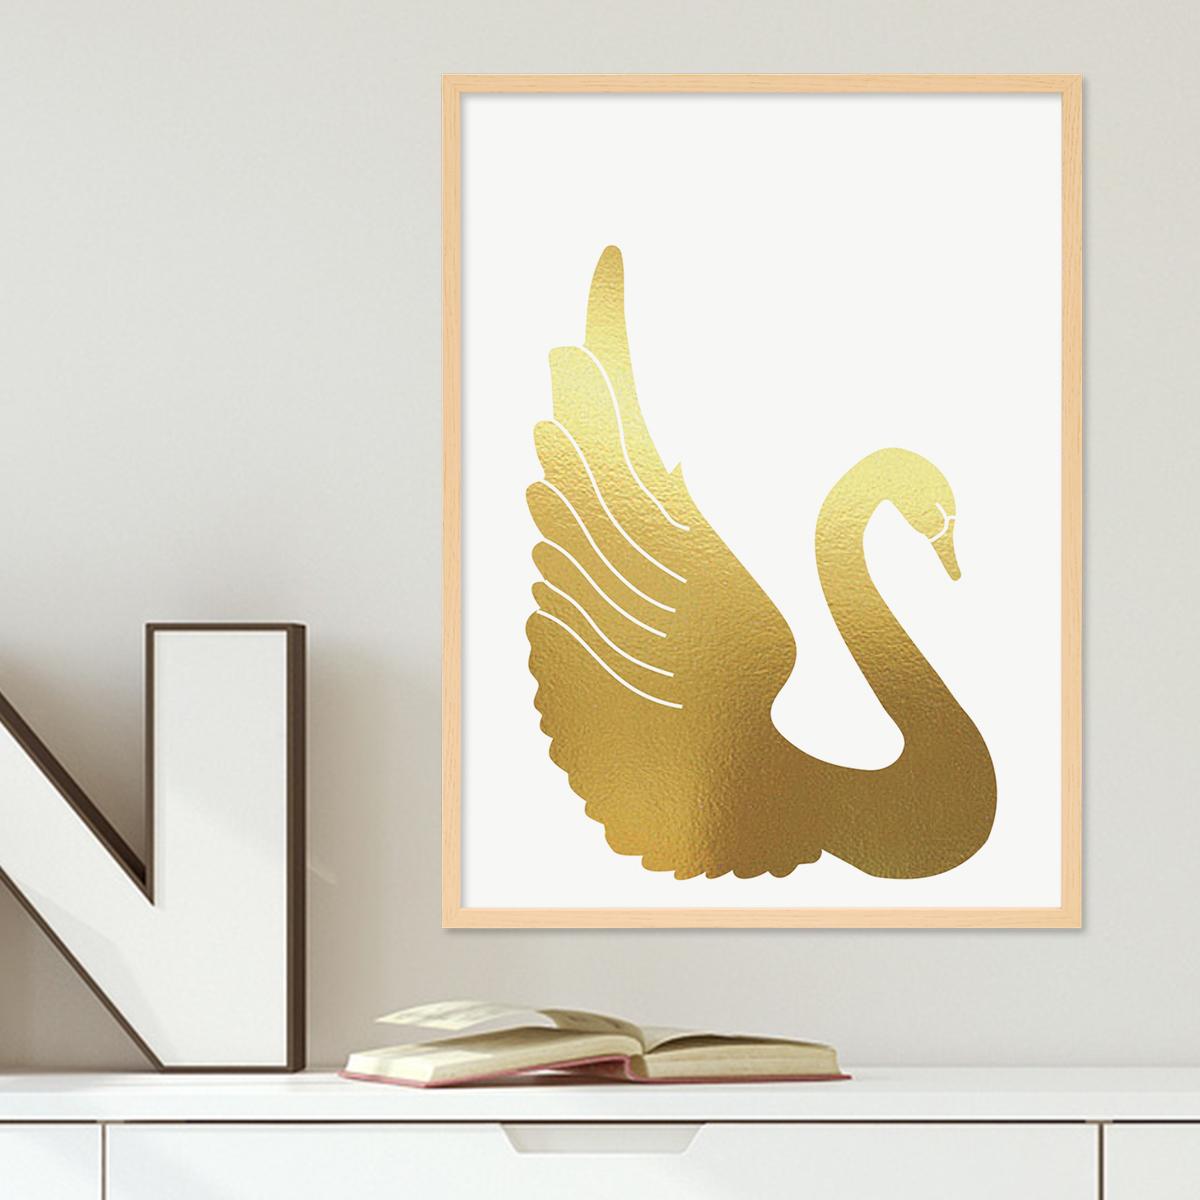 Design-Poster mit Bilderrahmen Natur \'Goldener Schwan\' 30x40 cm ...